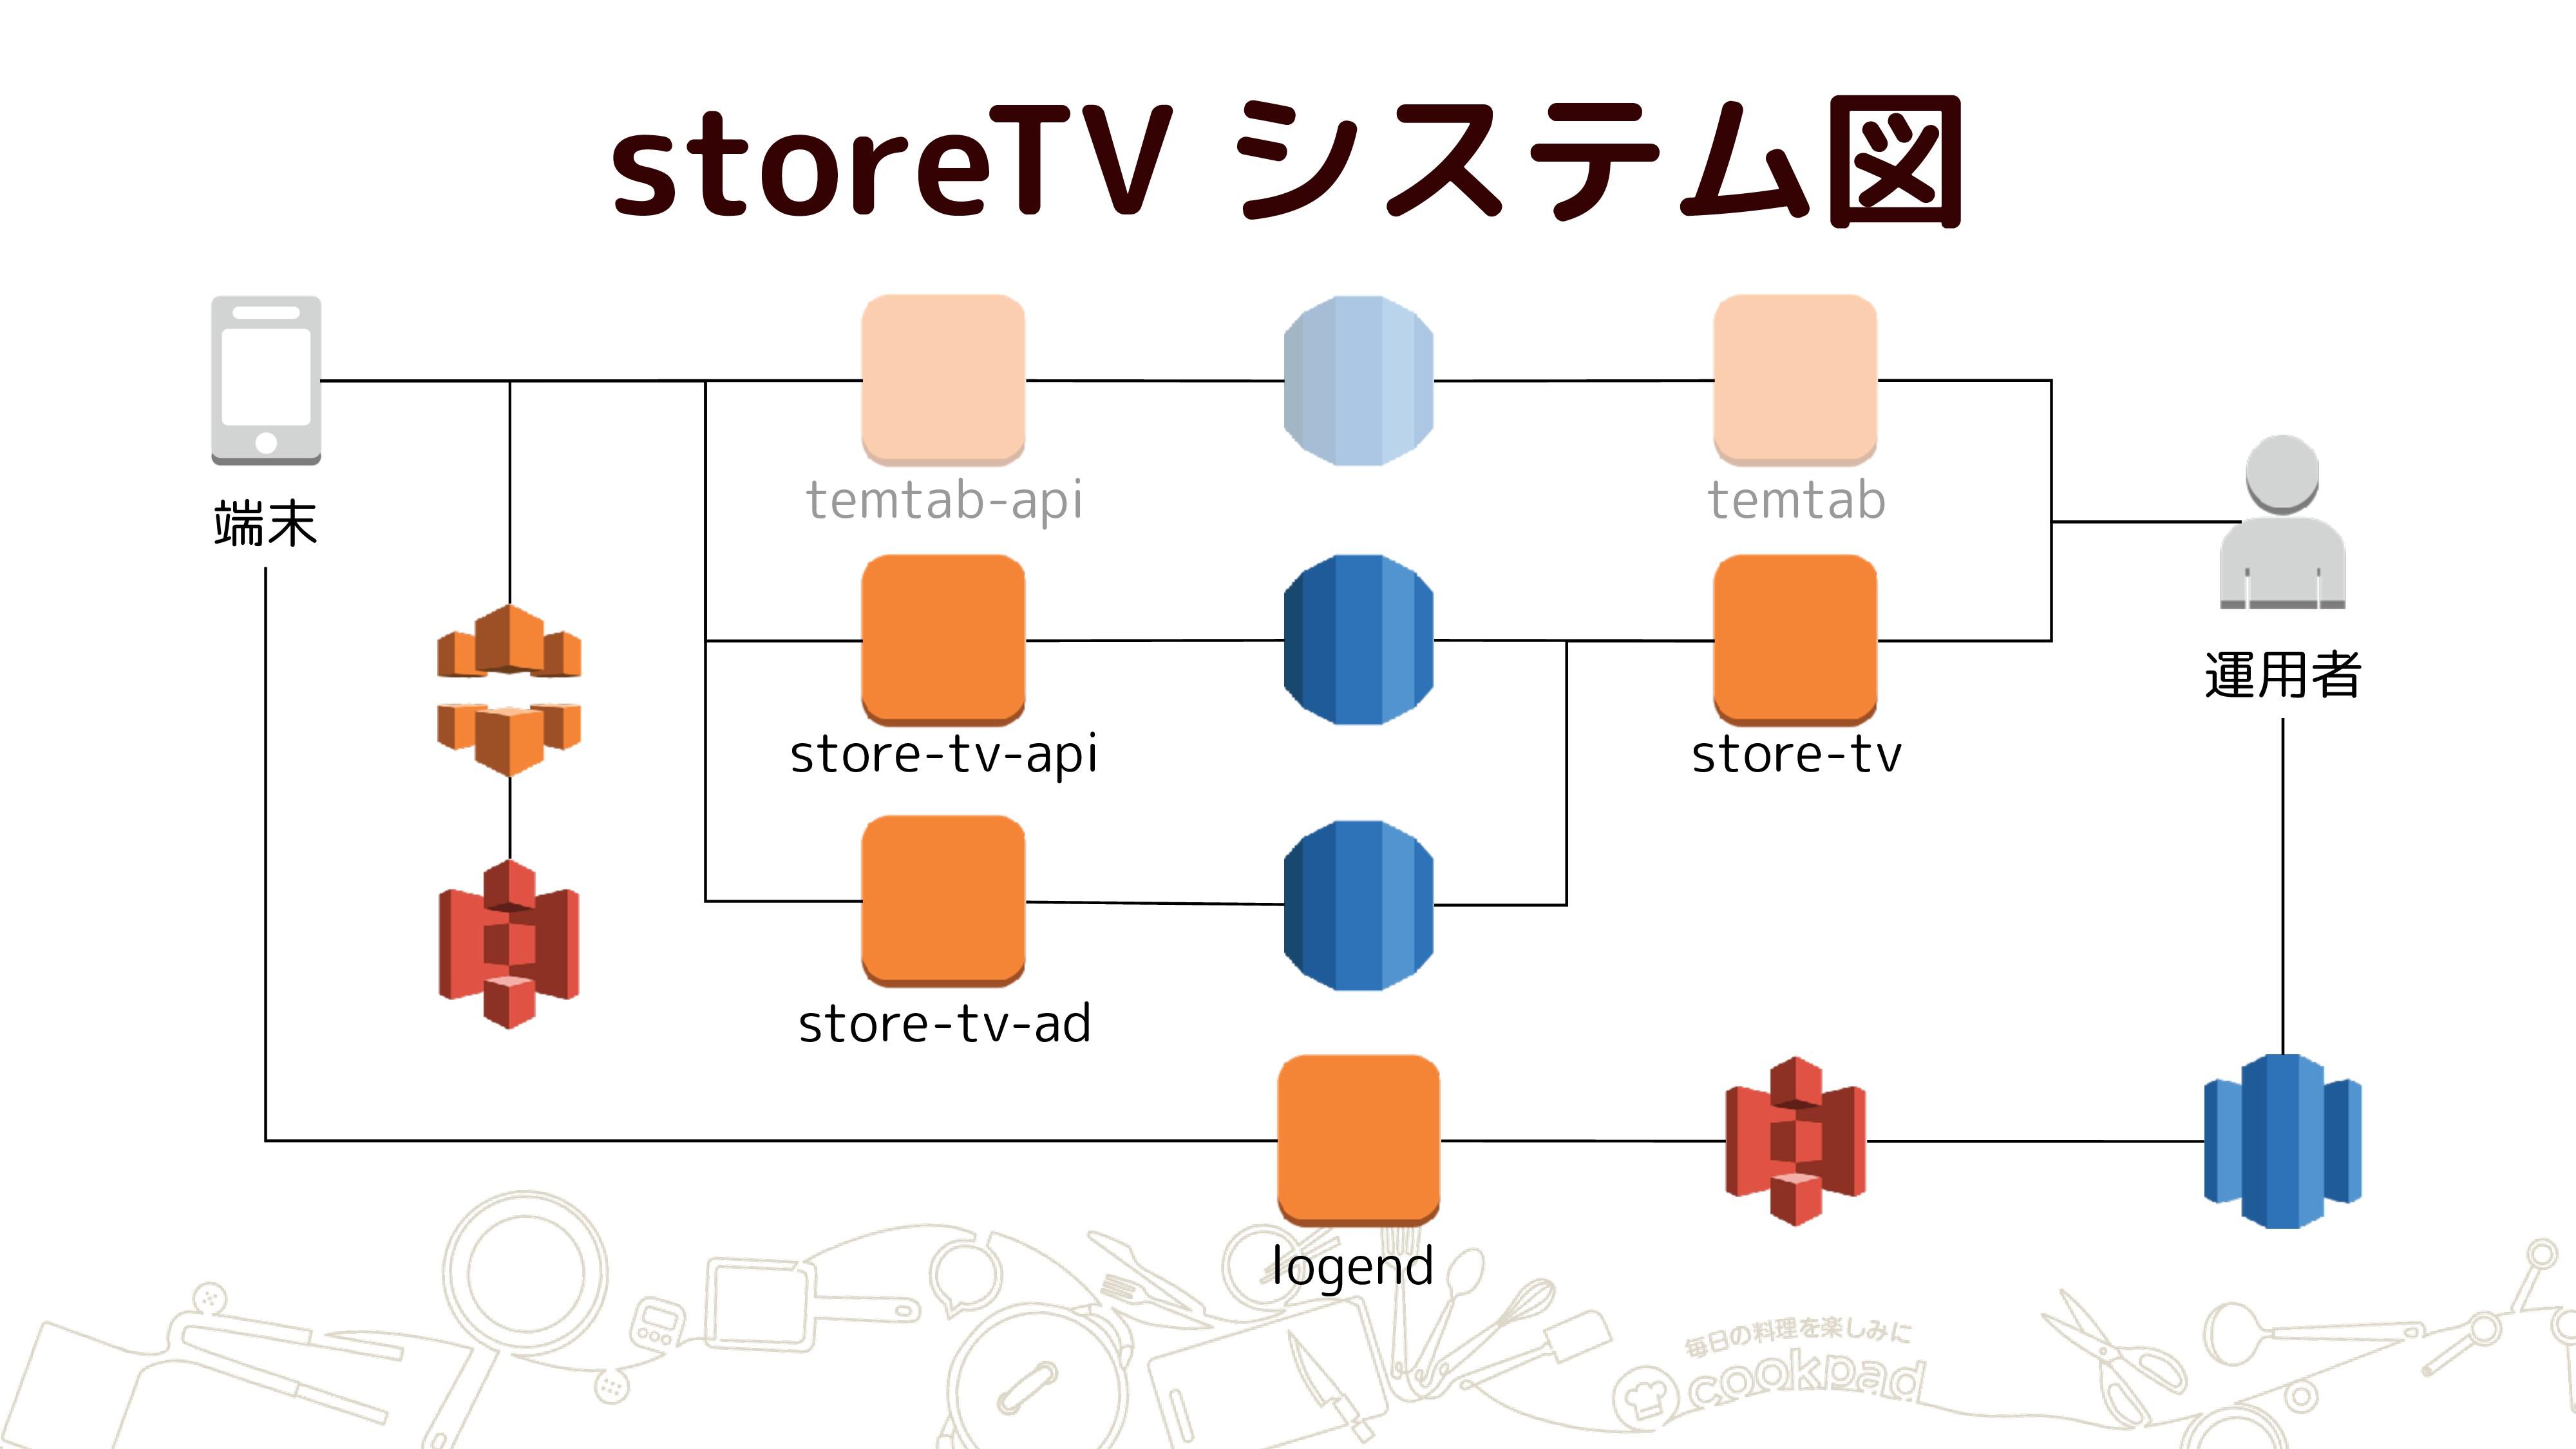 storeTV システム図 端末 運用者 temtab-api store-tv-api st...